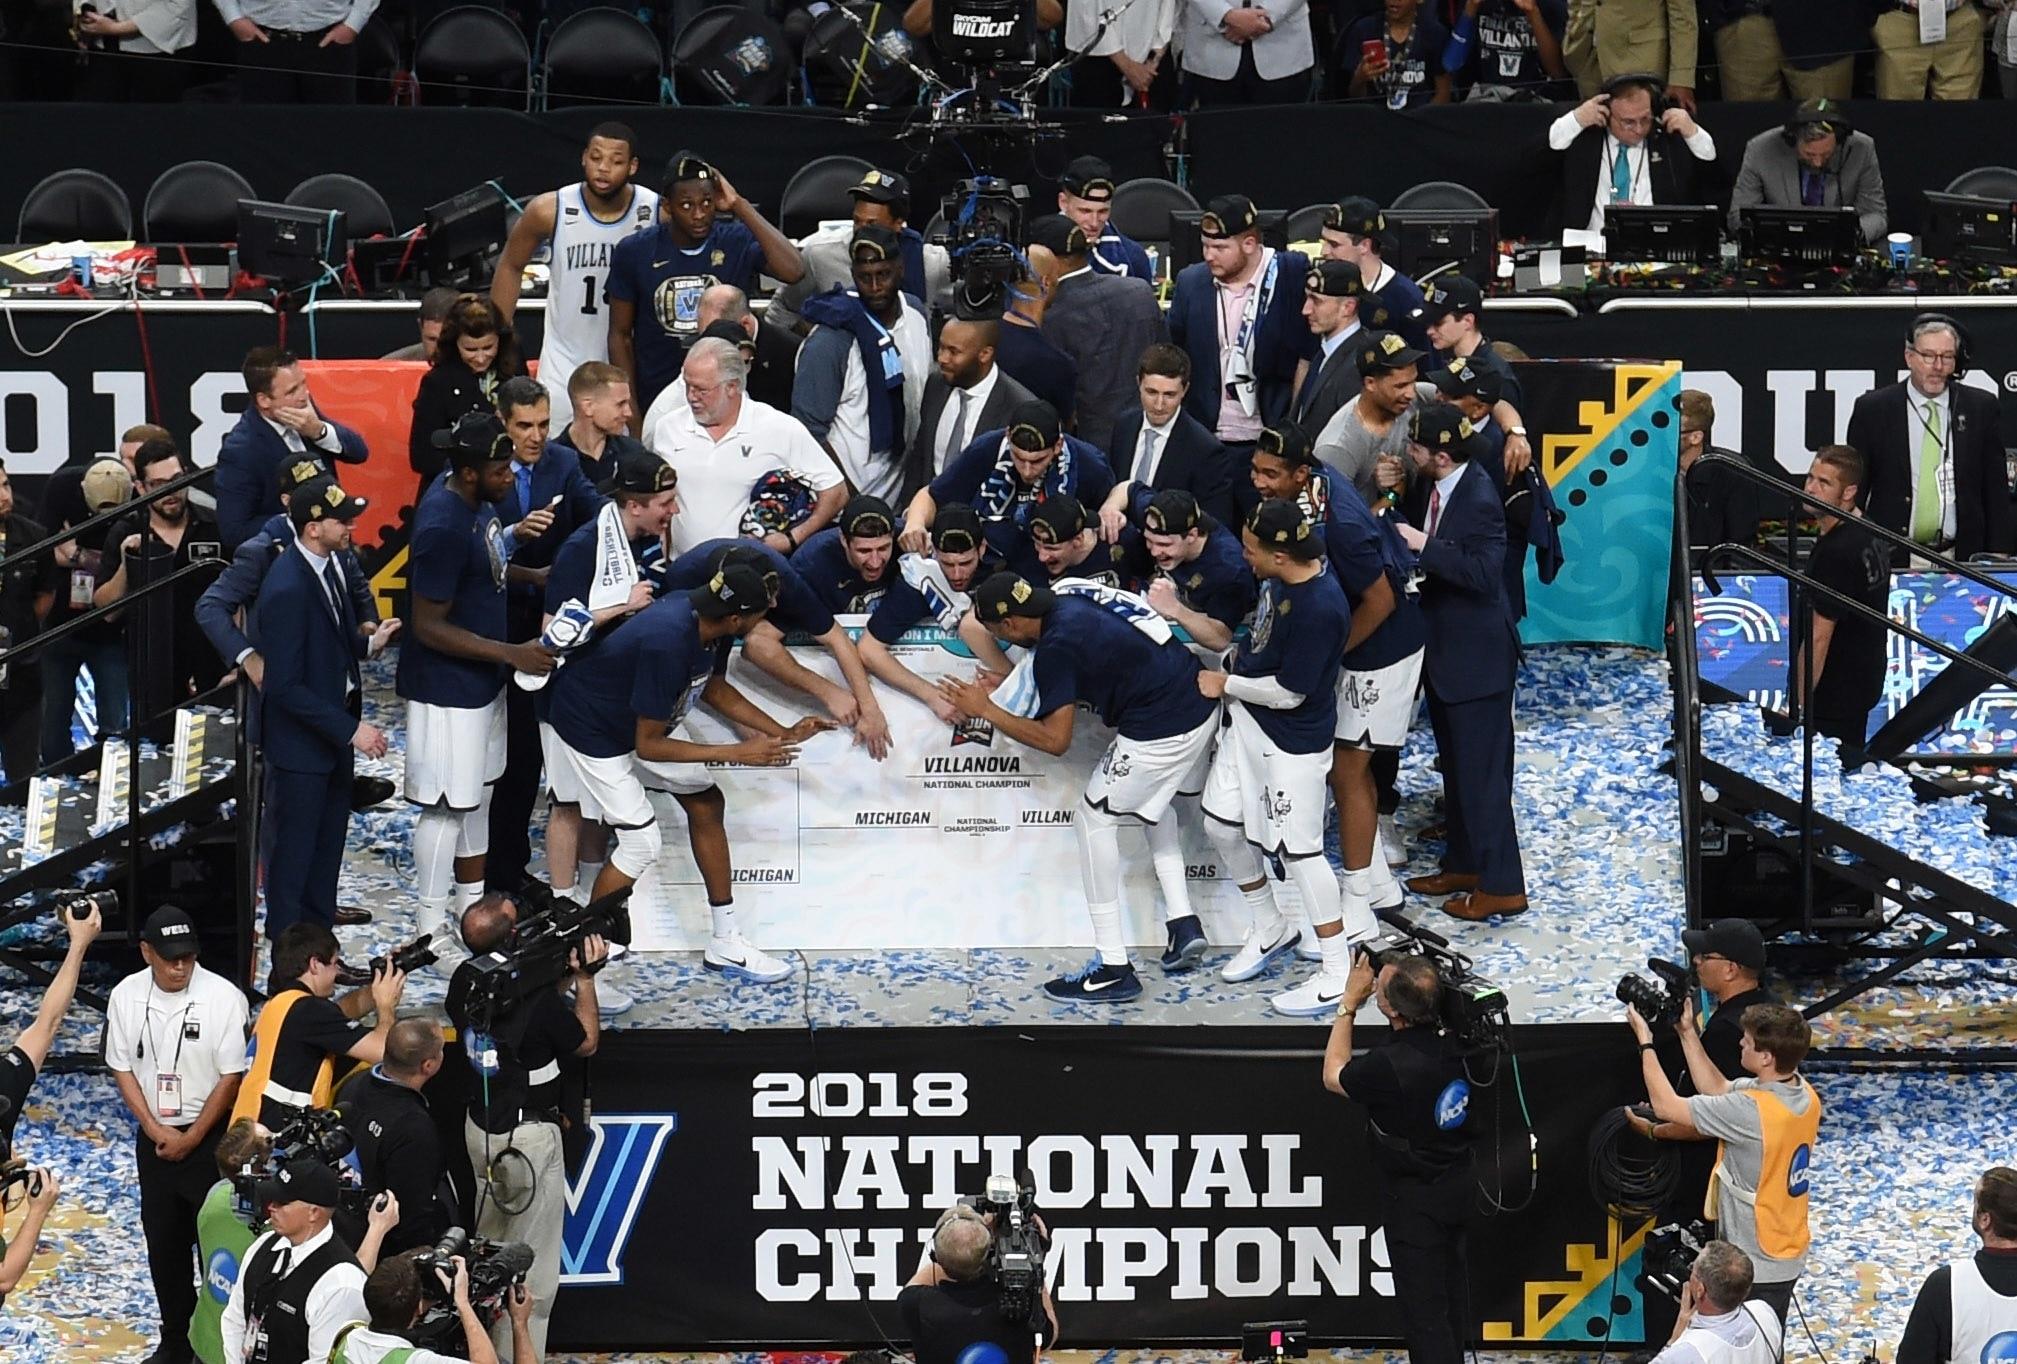 Final Four sites selected for 2023 through 2026 | NCAA com